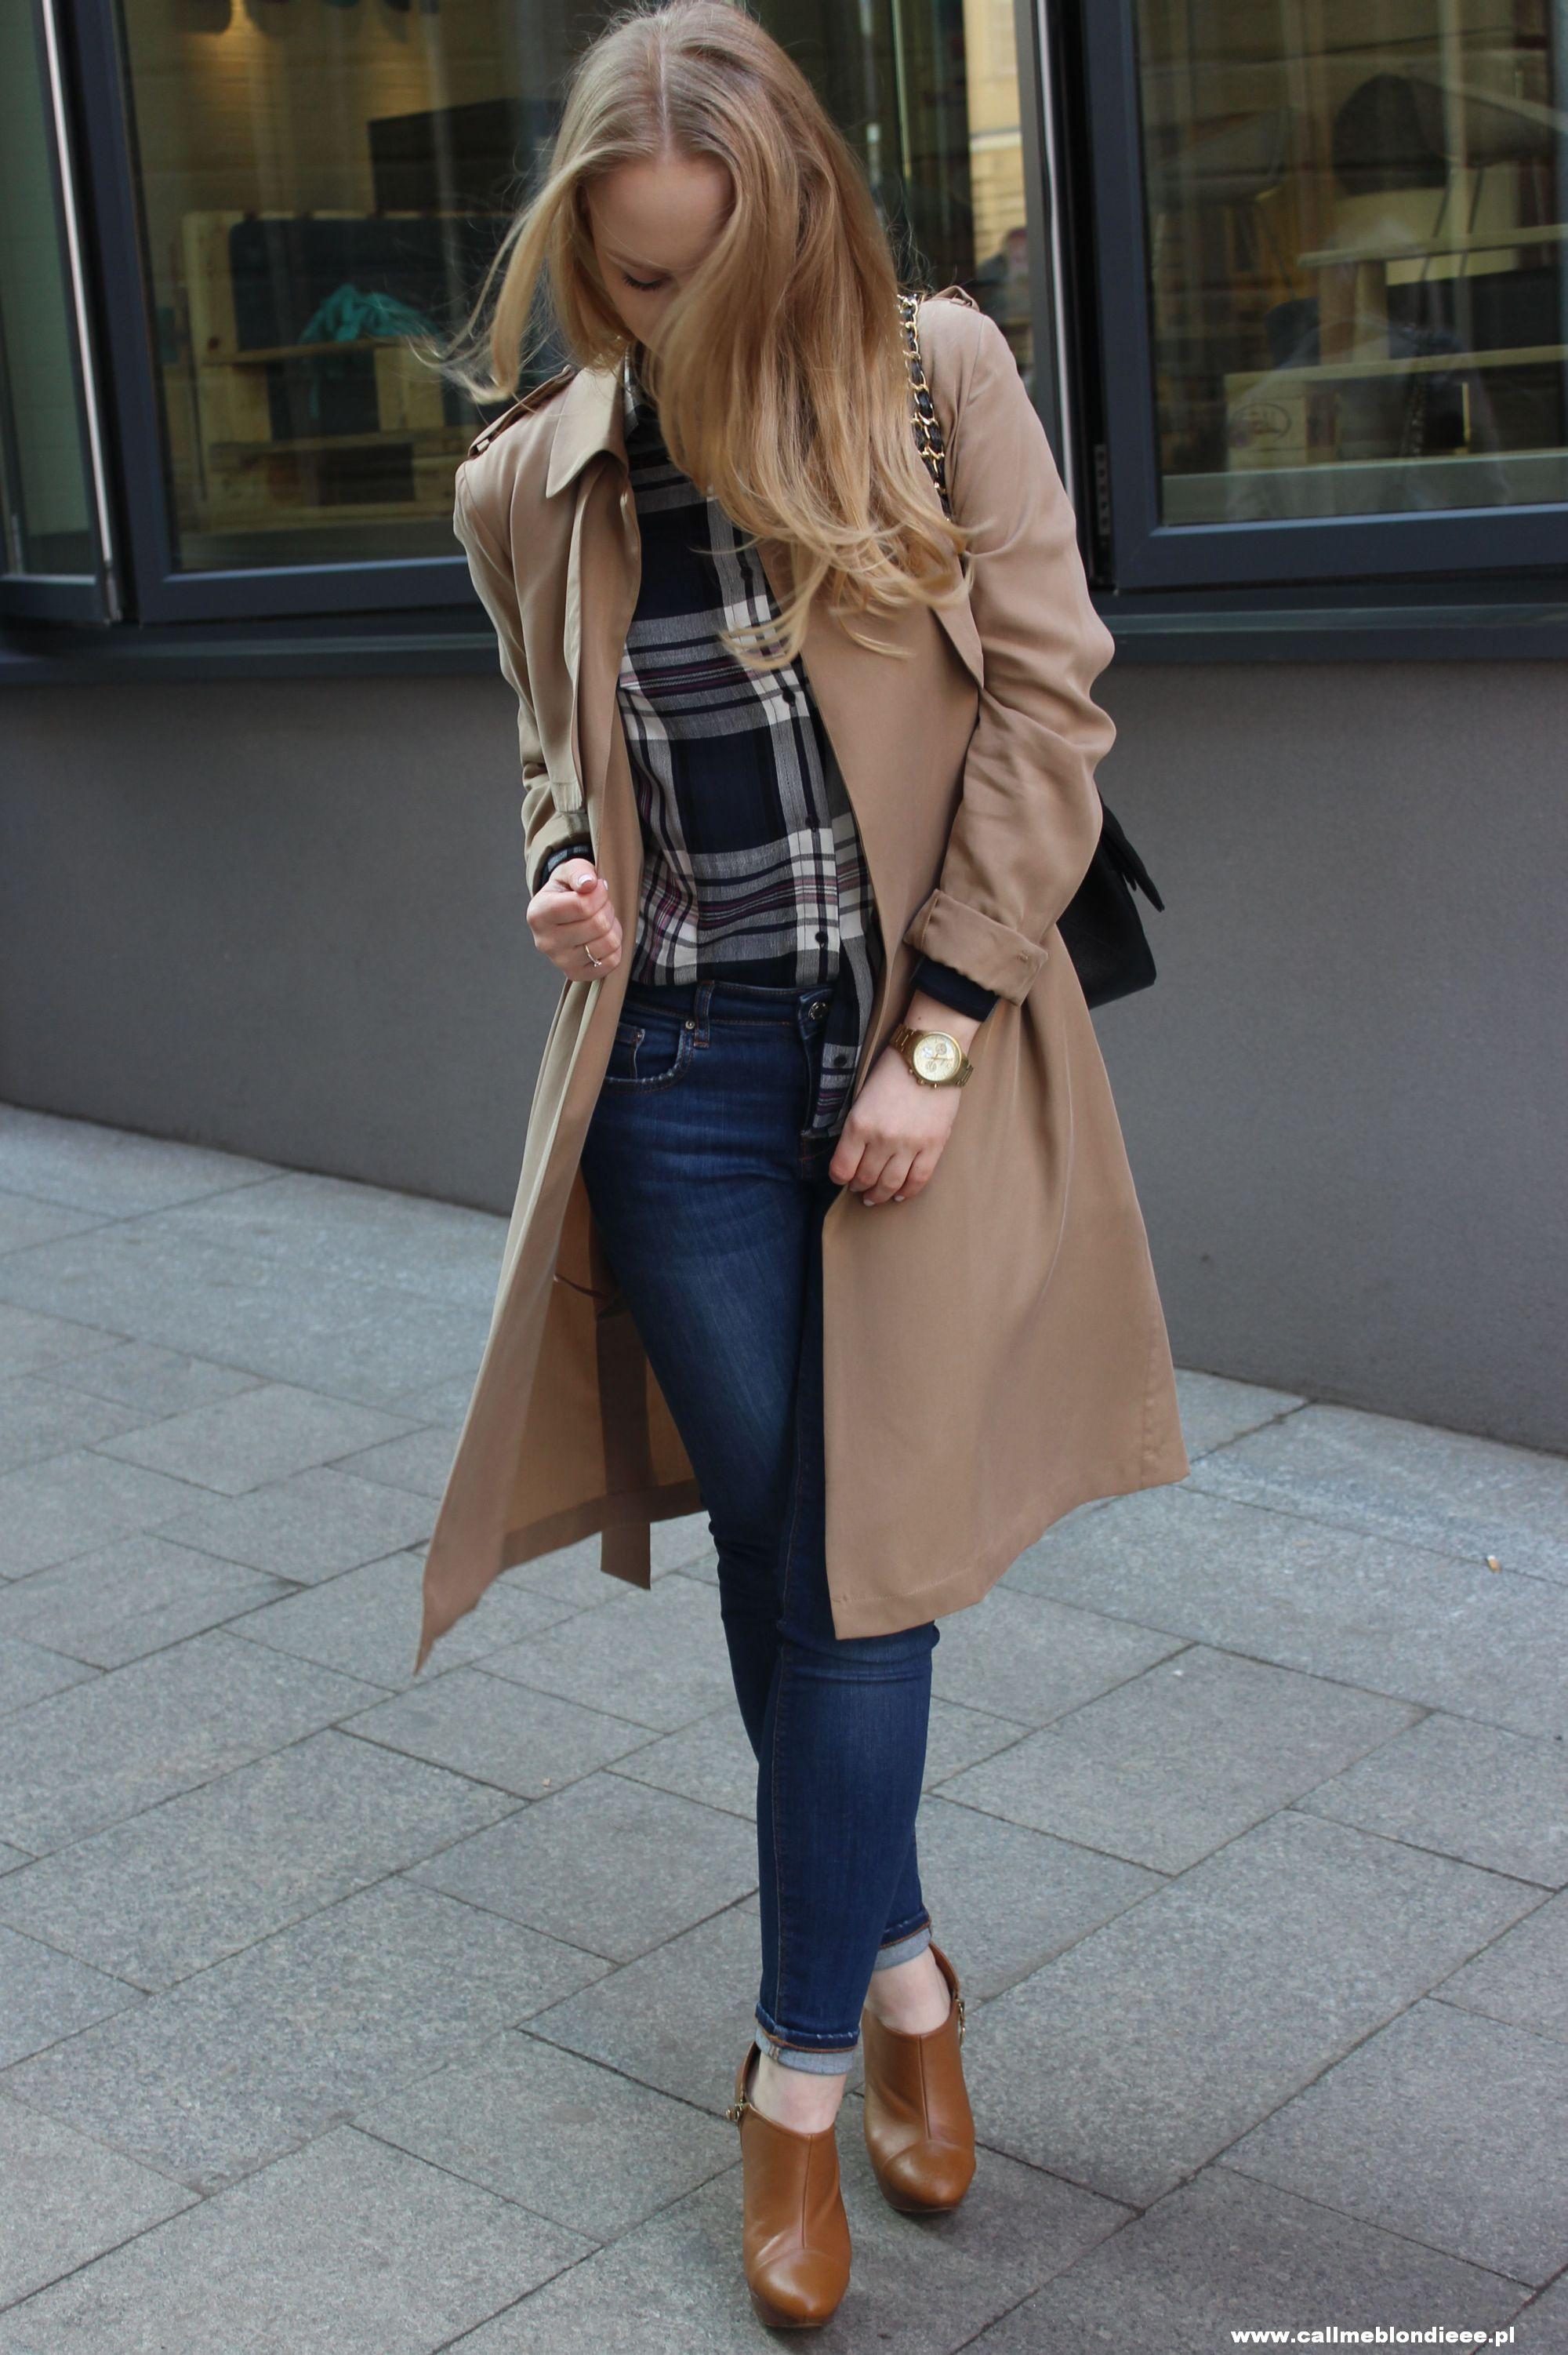 OOTD - Classic Look & Classic Bag 2